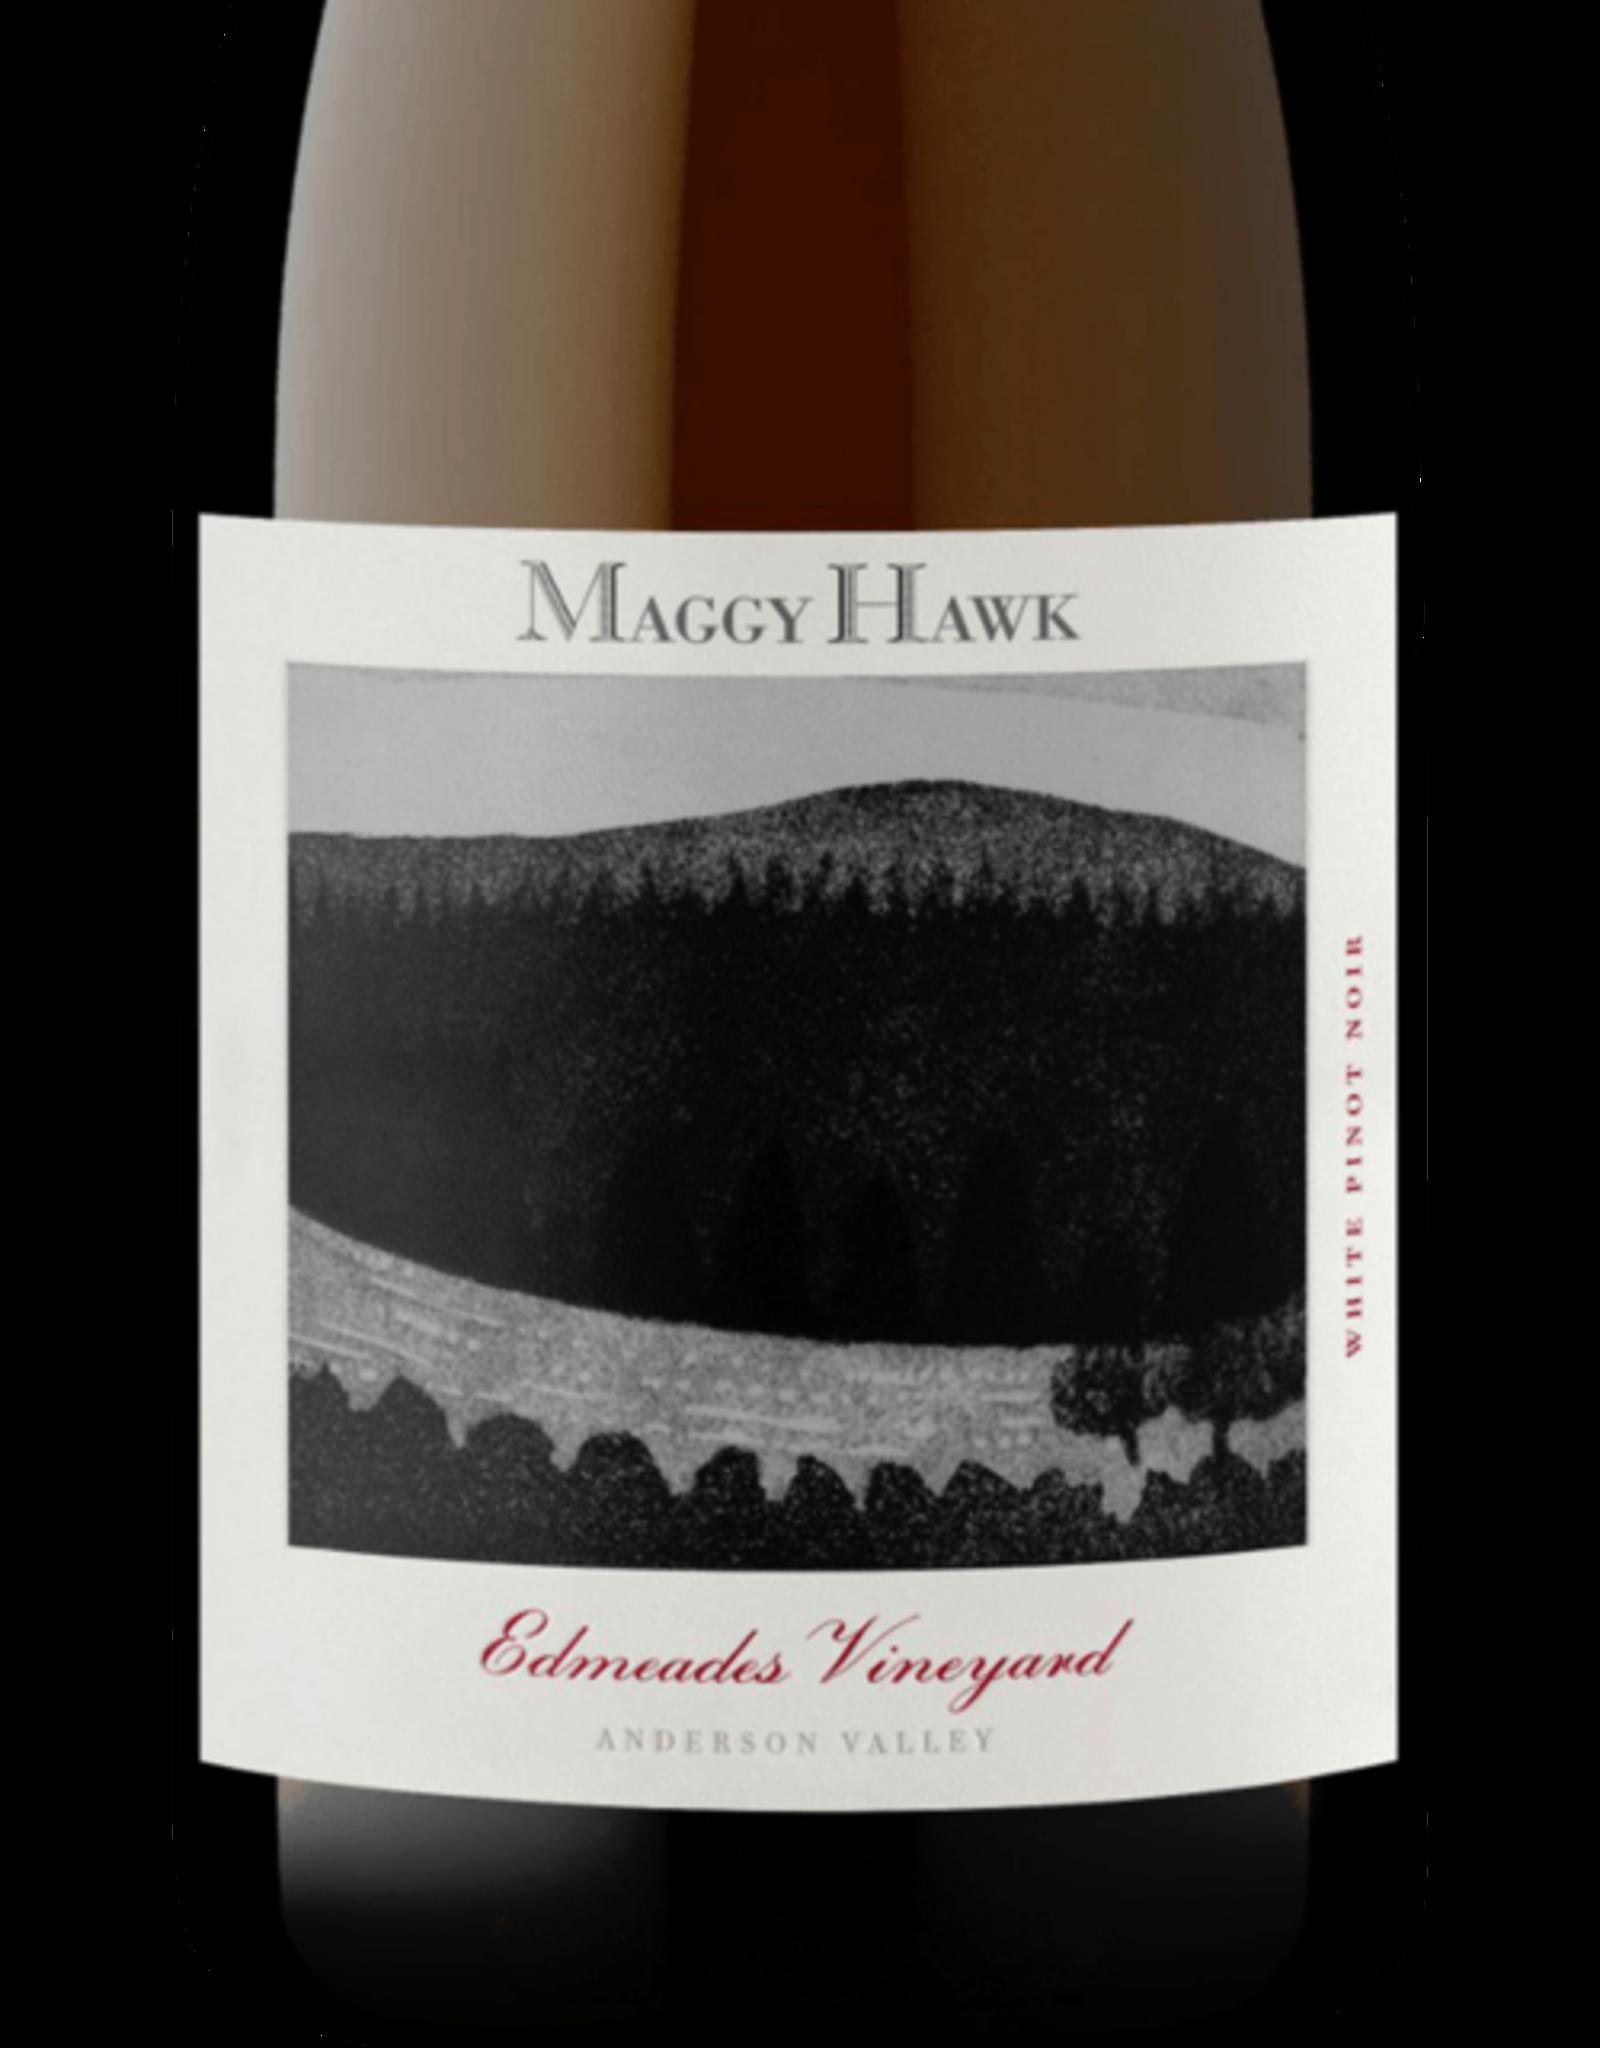 Maggy Hawk Edmeades Vineyard White Pinot Noir 2018